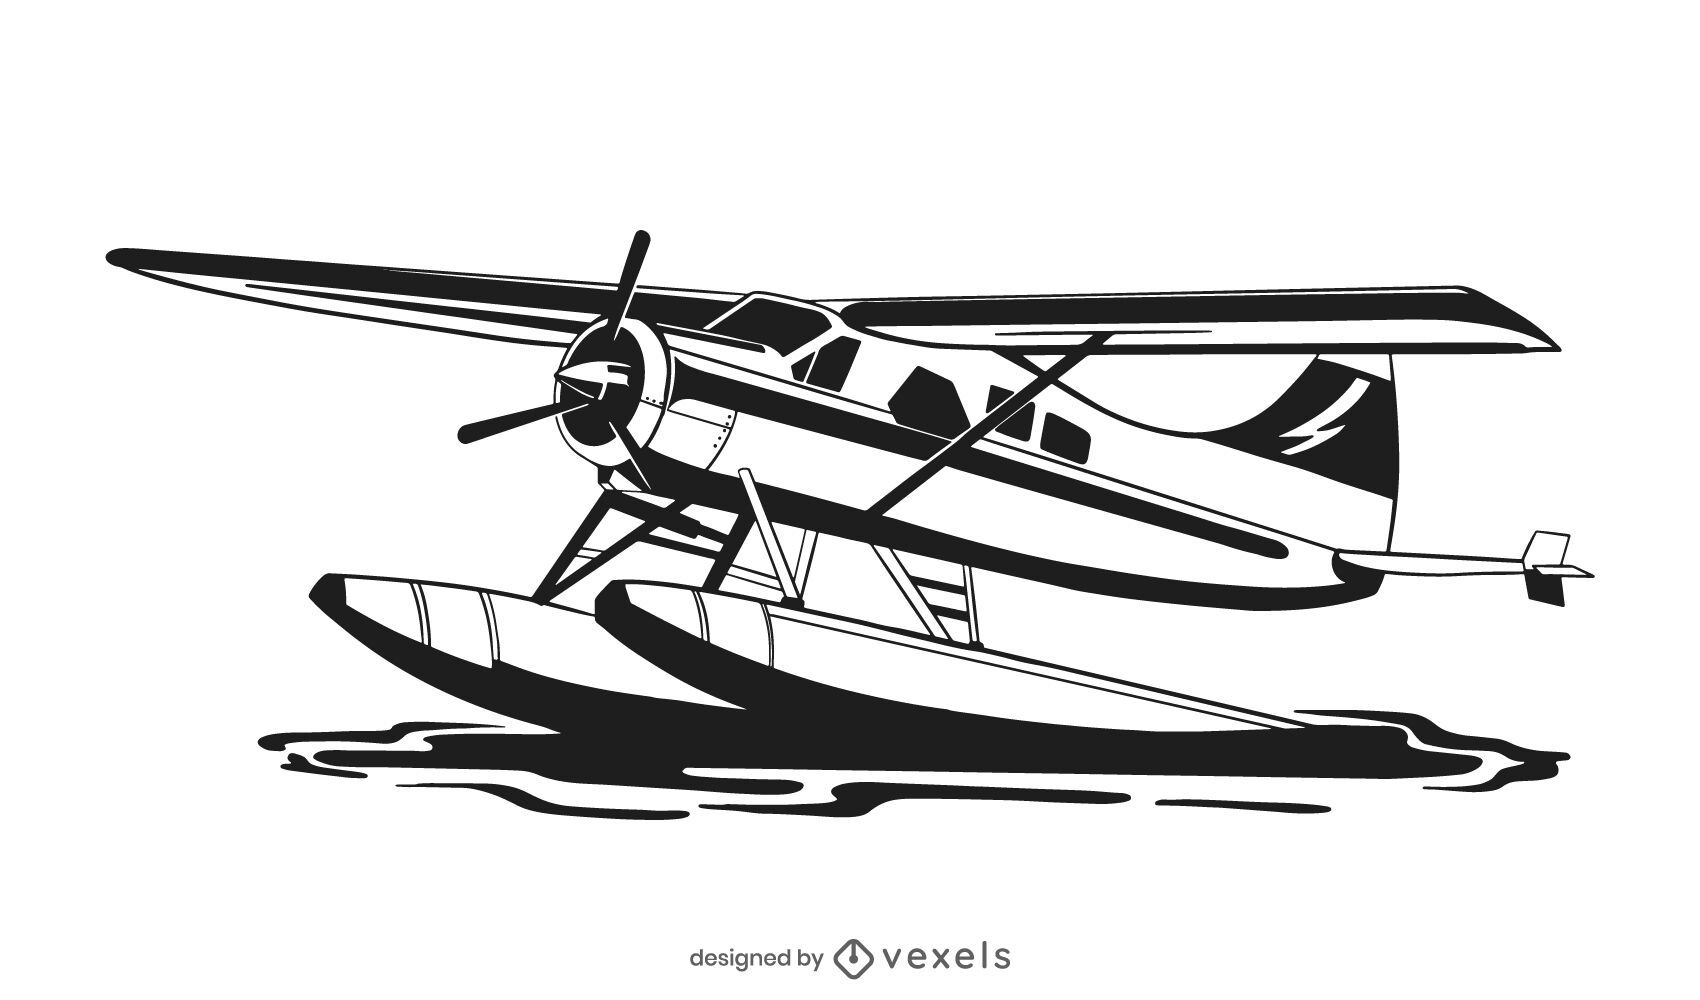 Seaplane Aircraft Illustration Design